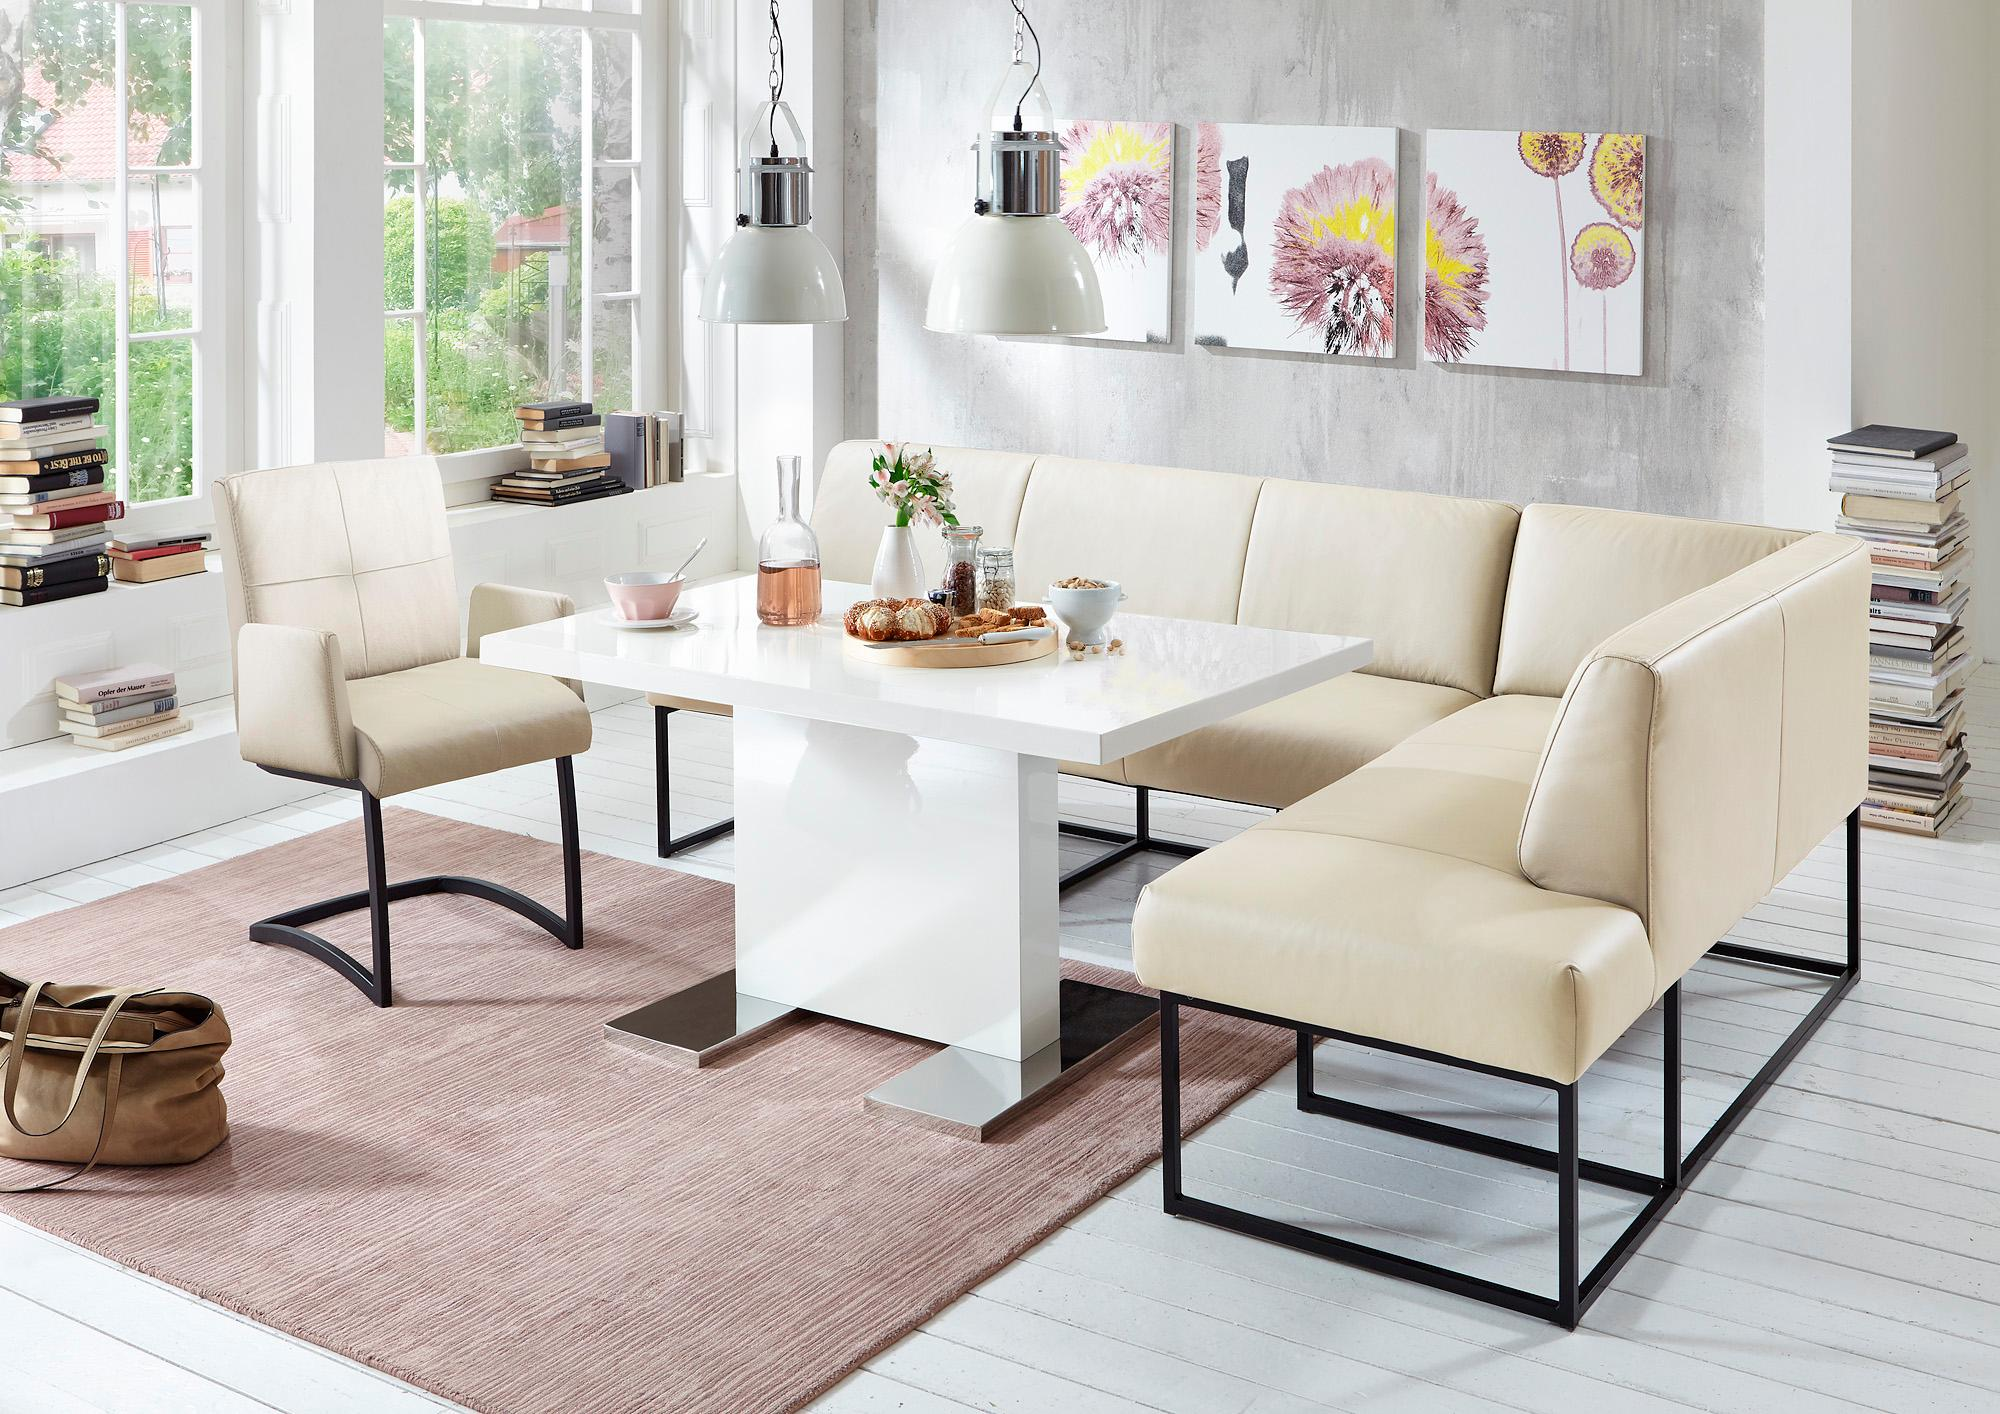 exxpo - sofa fashion Eckbank | Küche und Esszimmer > Sitzbänke > Eckbänke | Braun | EXXPO - SOFA FASHION